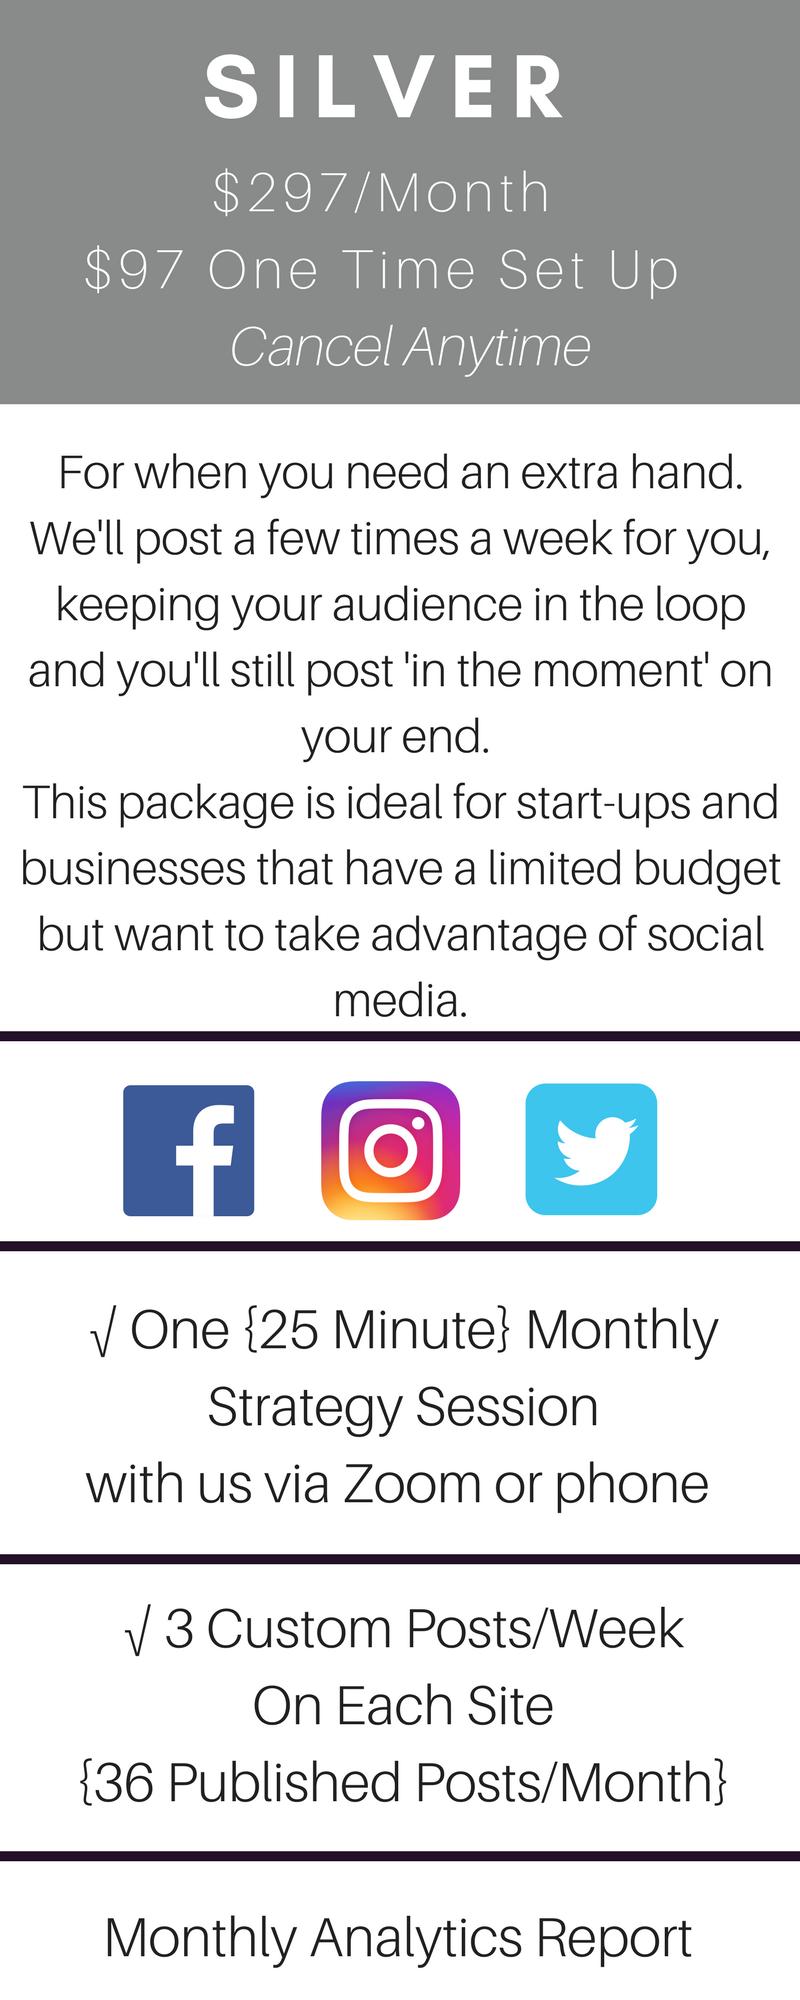 silver social media marketing package - perfectwavemarketing.com.png